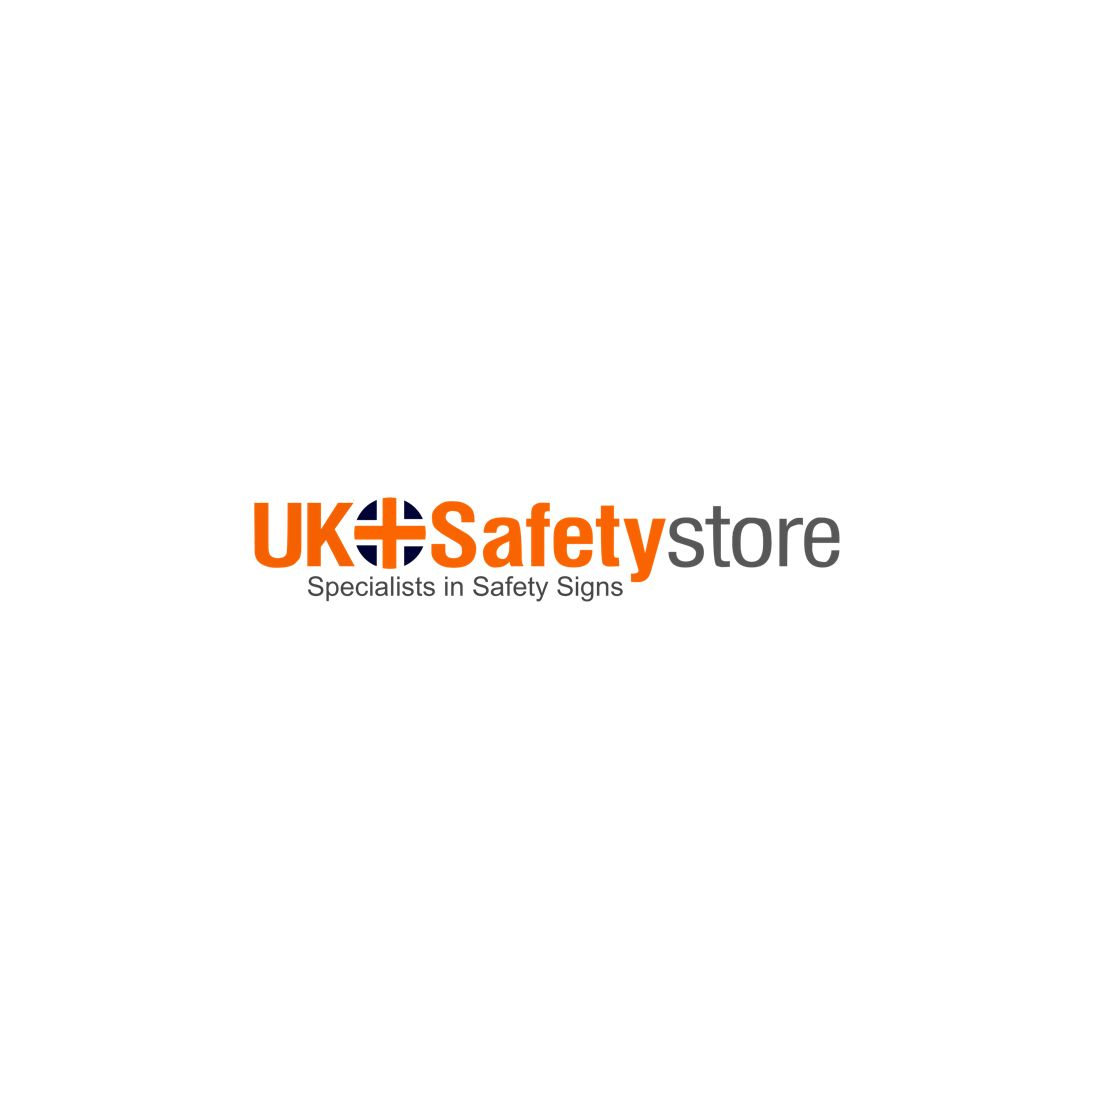 Pack of 24 Helmet Protection Labels 100mm in Diameter